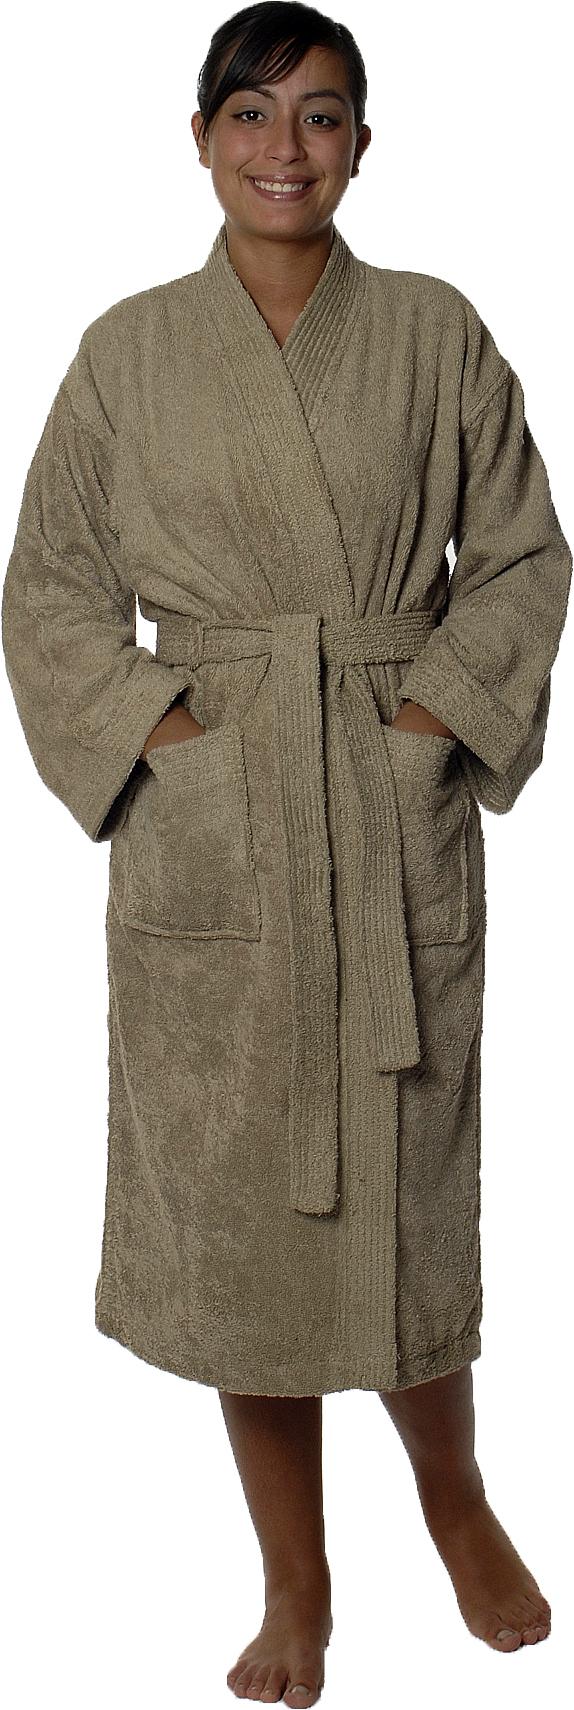 Peignoir col kimono en Coton couleur Taupe Taille S (Taupe)